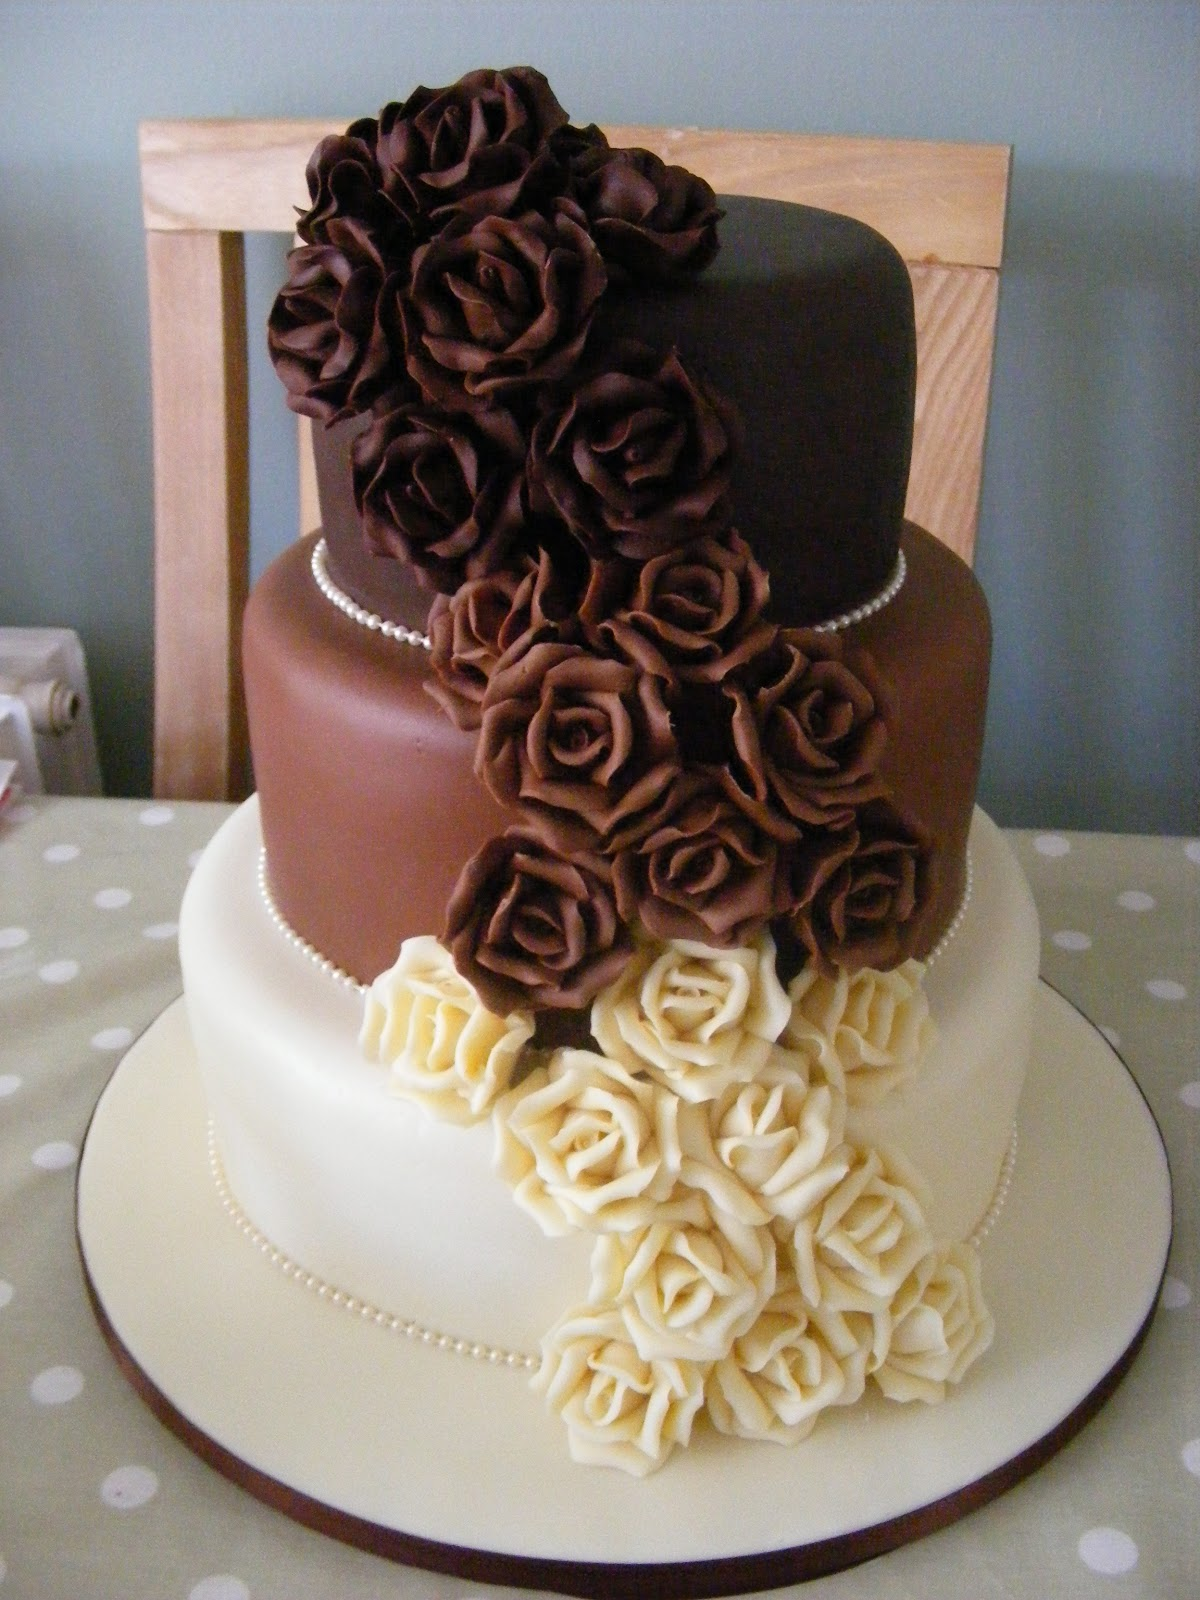 Cakes By Karen Chocolate Rose Wedding Cake Three Tier